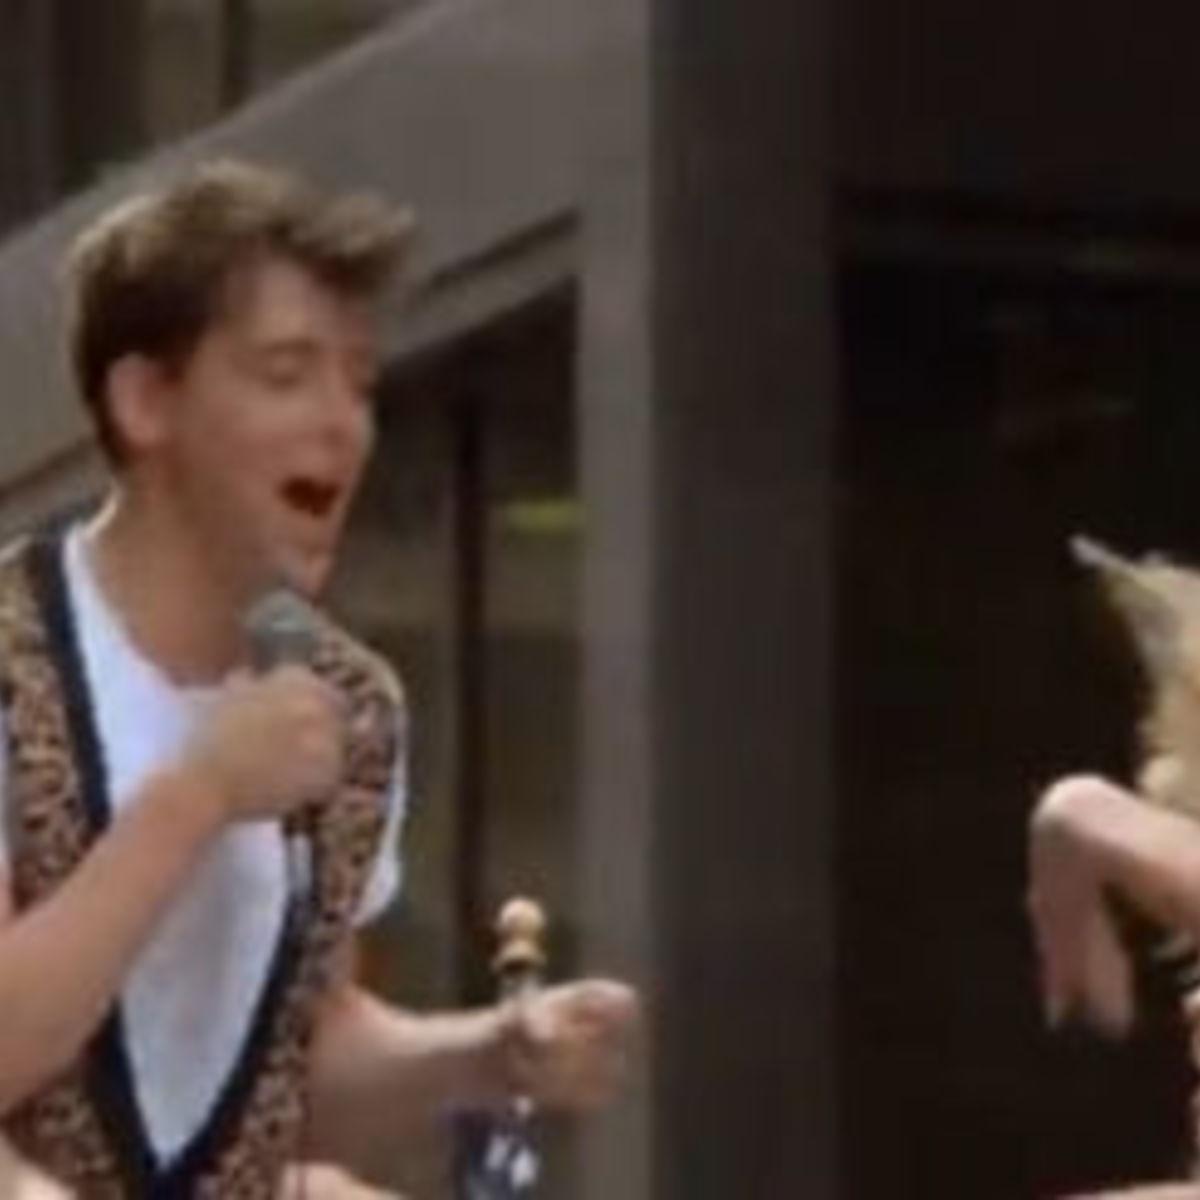 Ferris_Bueller_twist_and_shout.jpg